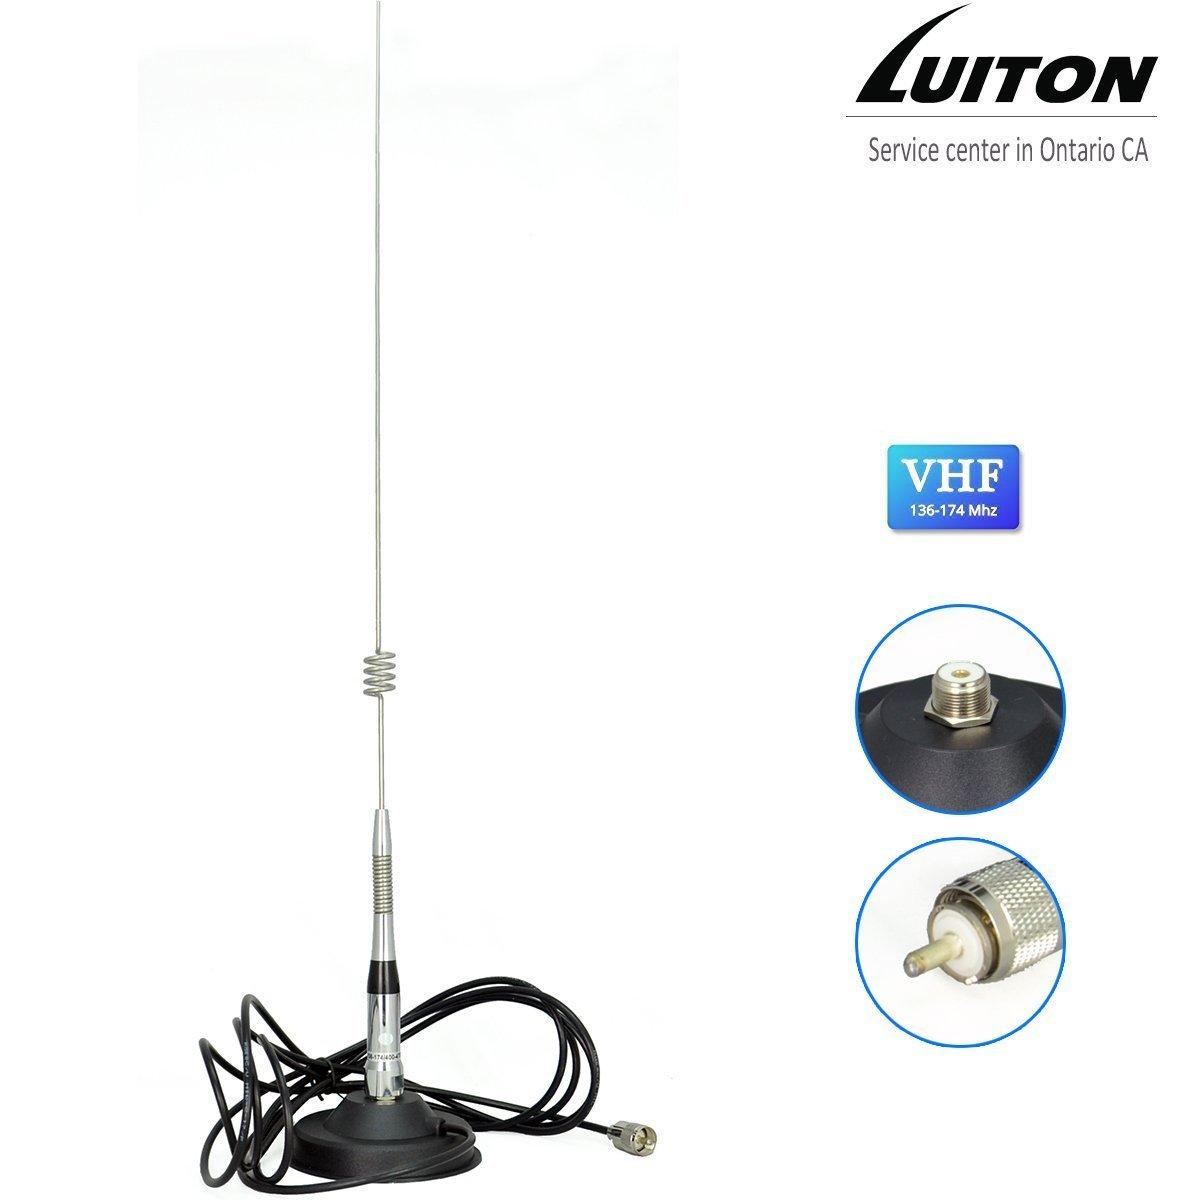 Luiton Mobile Radio Antenna 27 Inch VHF(136~174 MHz) Whip Base-load Magnetic Antenna for Luiton, Baofeng,BTECH Anytone Kenwood TYT Juentai Leixen Radioddity Mobile Radios(2 Meter & 70cm)